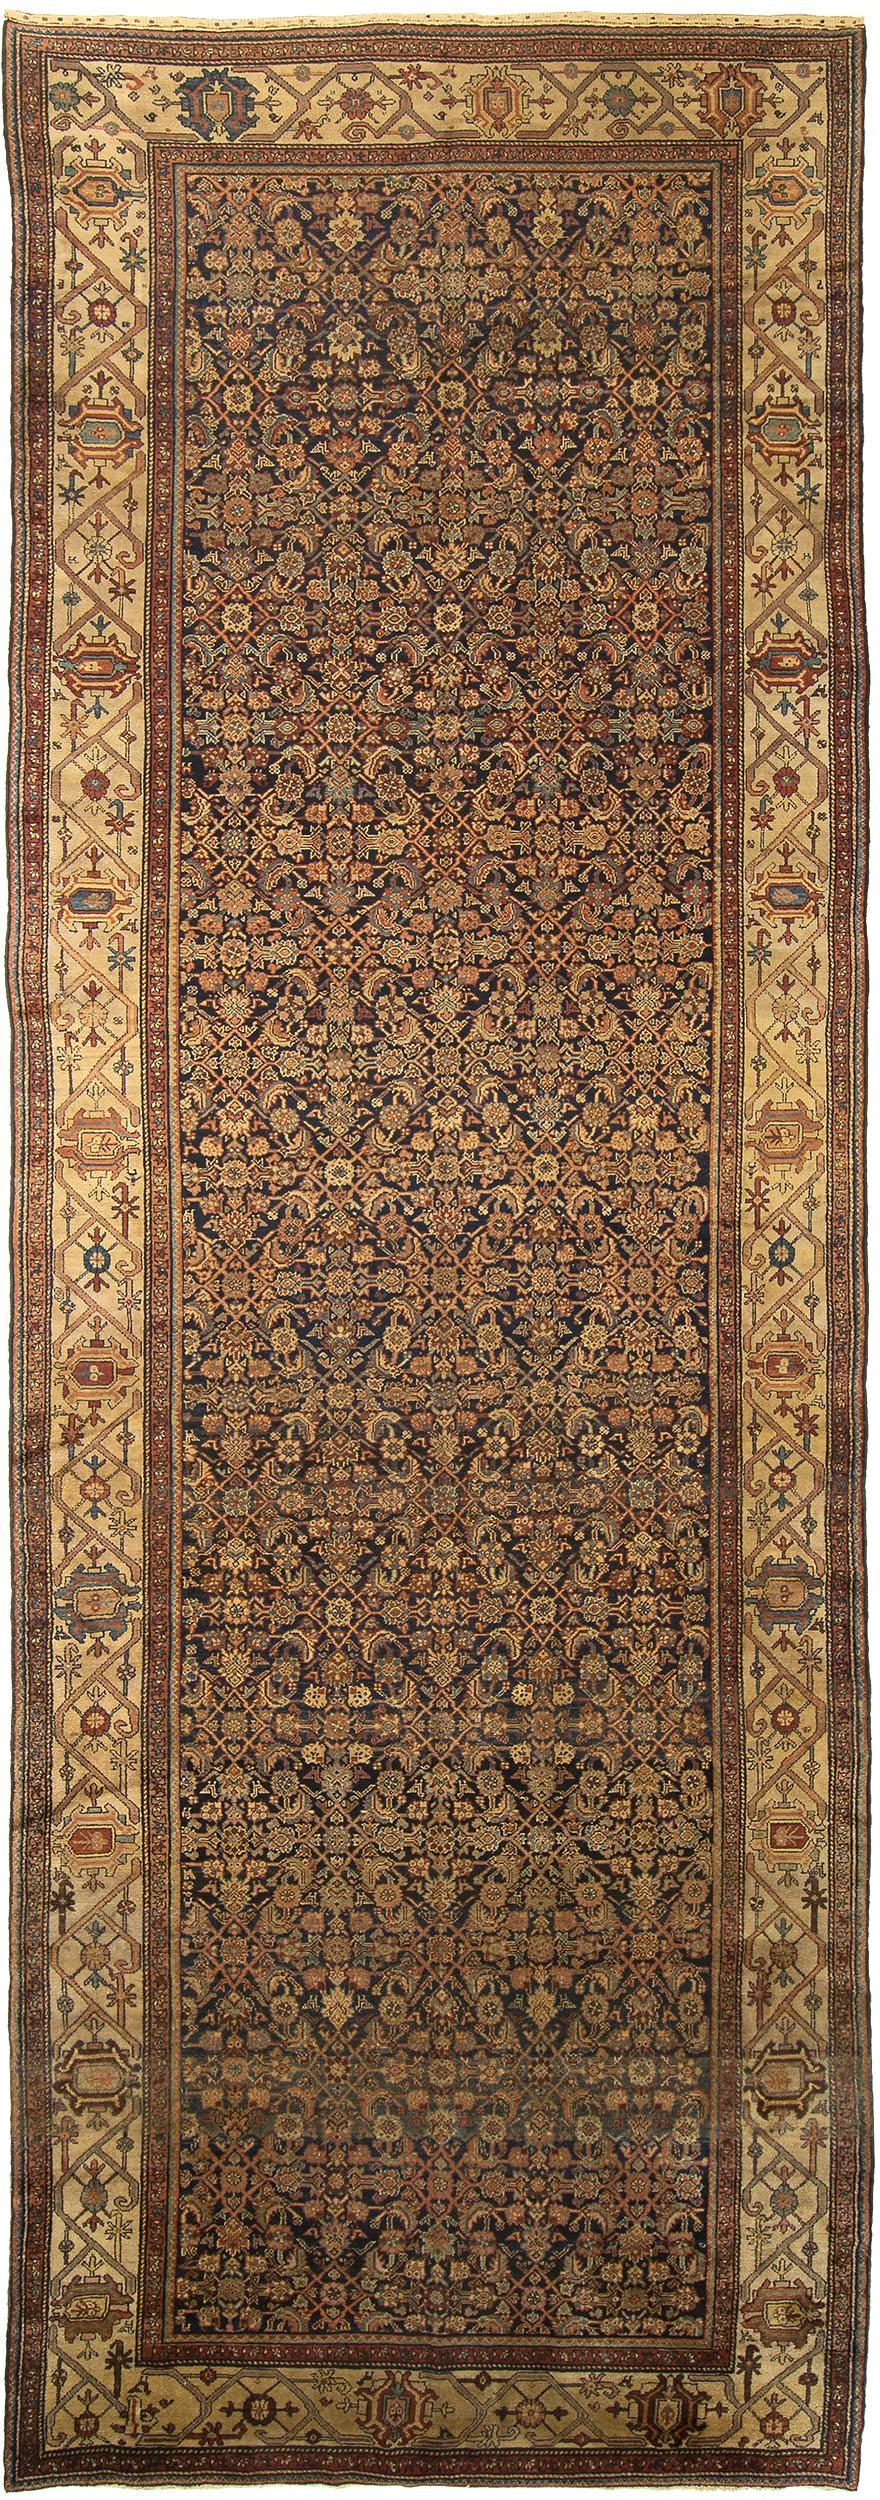 "NW Persian Gallery Carpet 19' 10"" x 6' 9"""